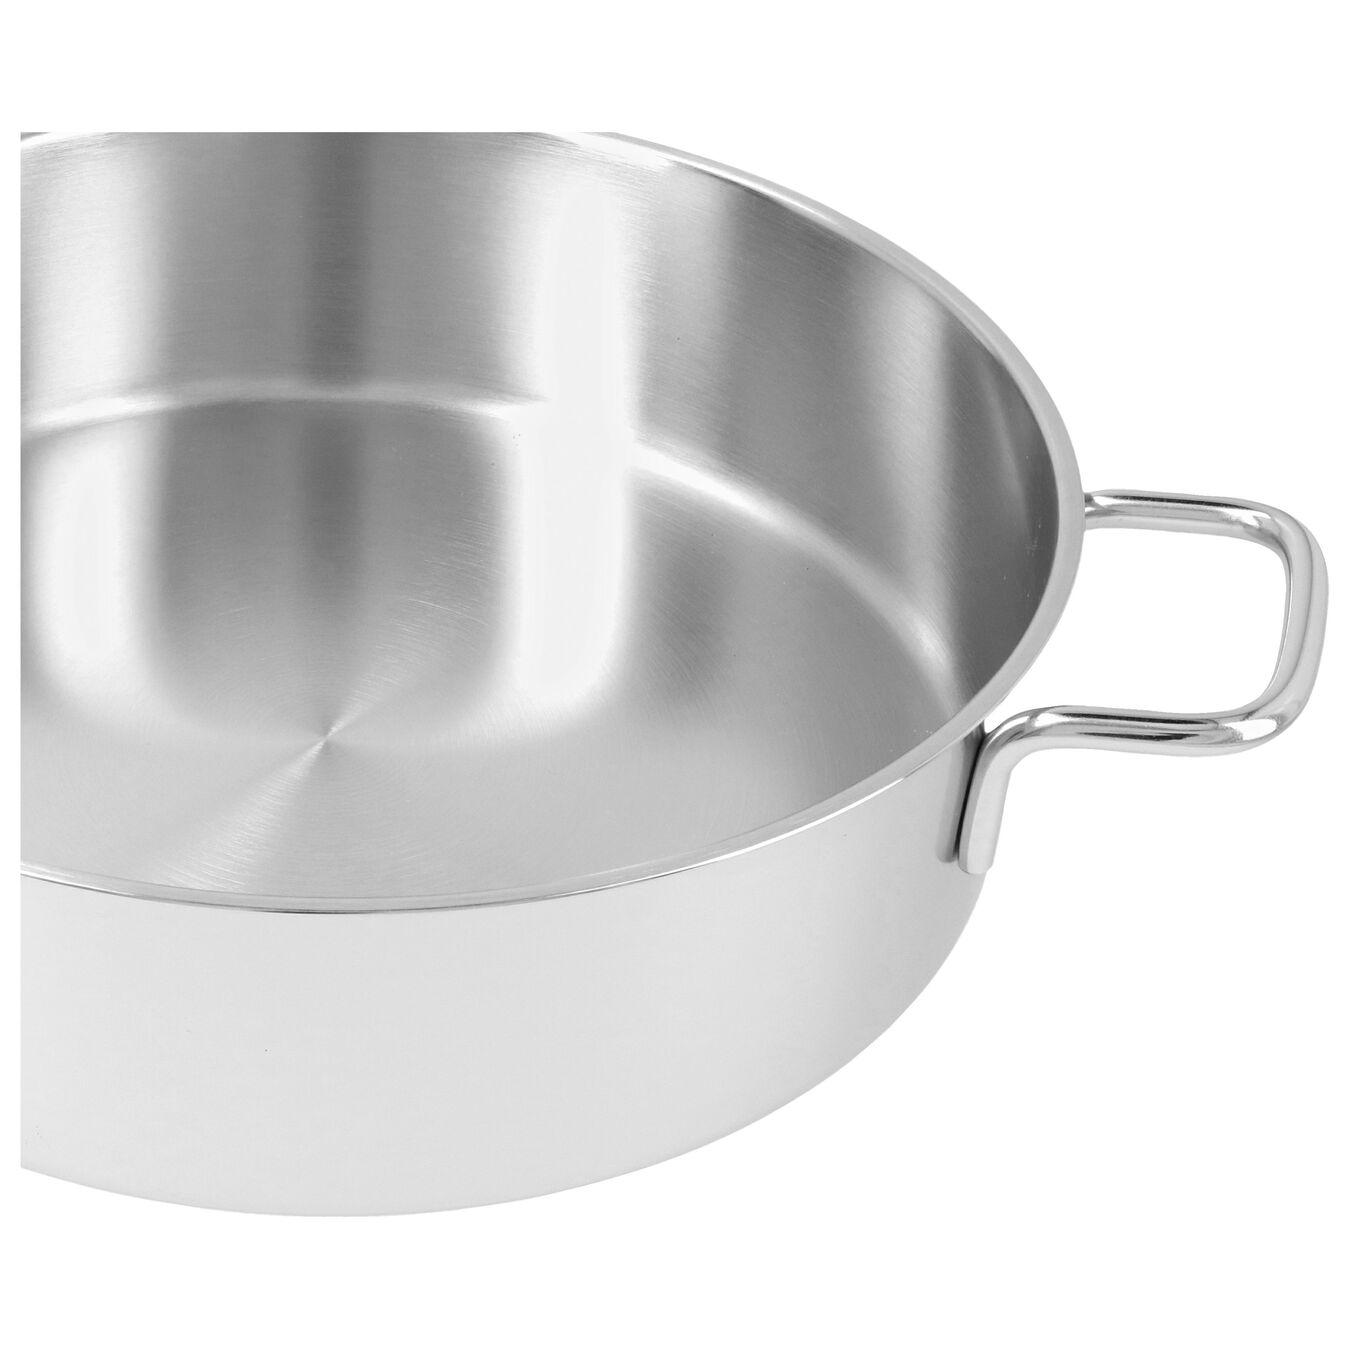 Kookpan met glazen deksel 28 cm / 4.75 l,,large 4